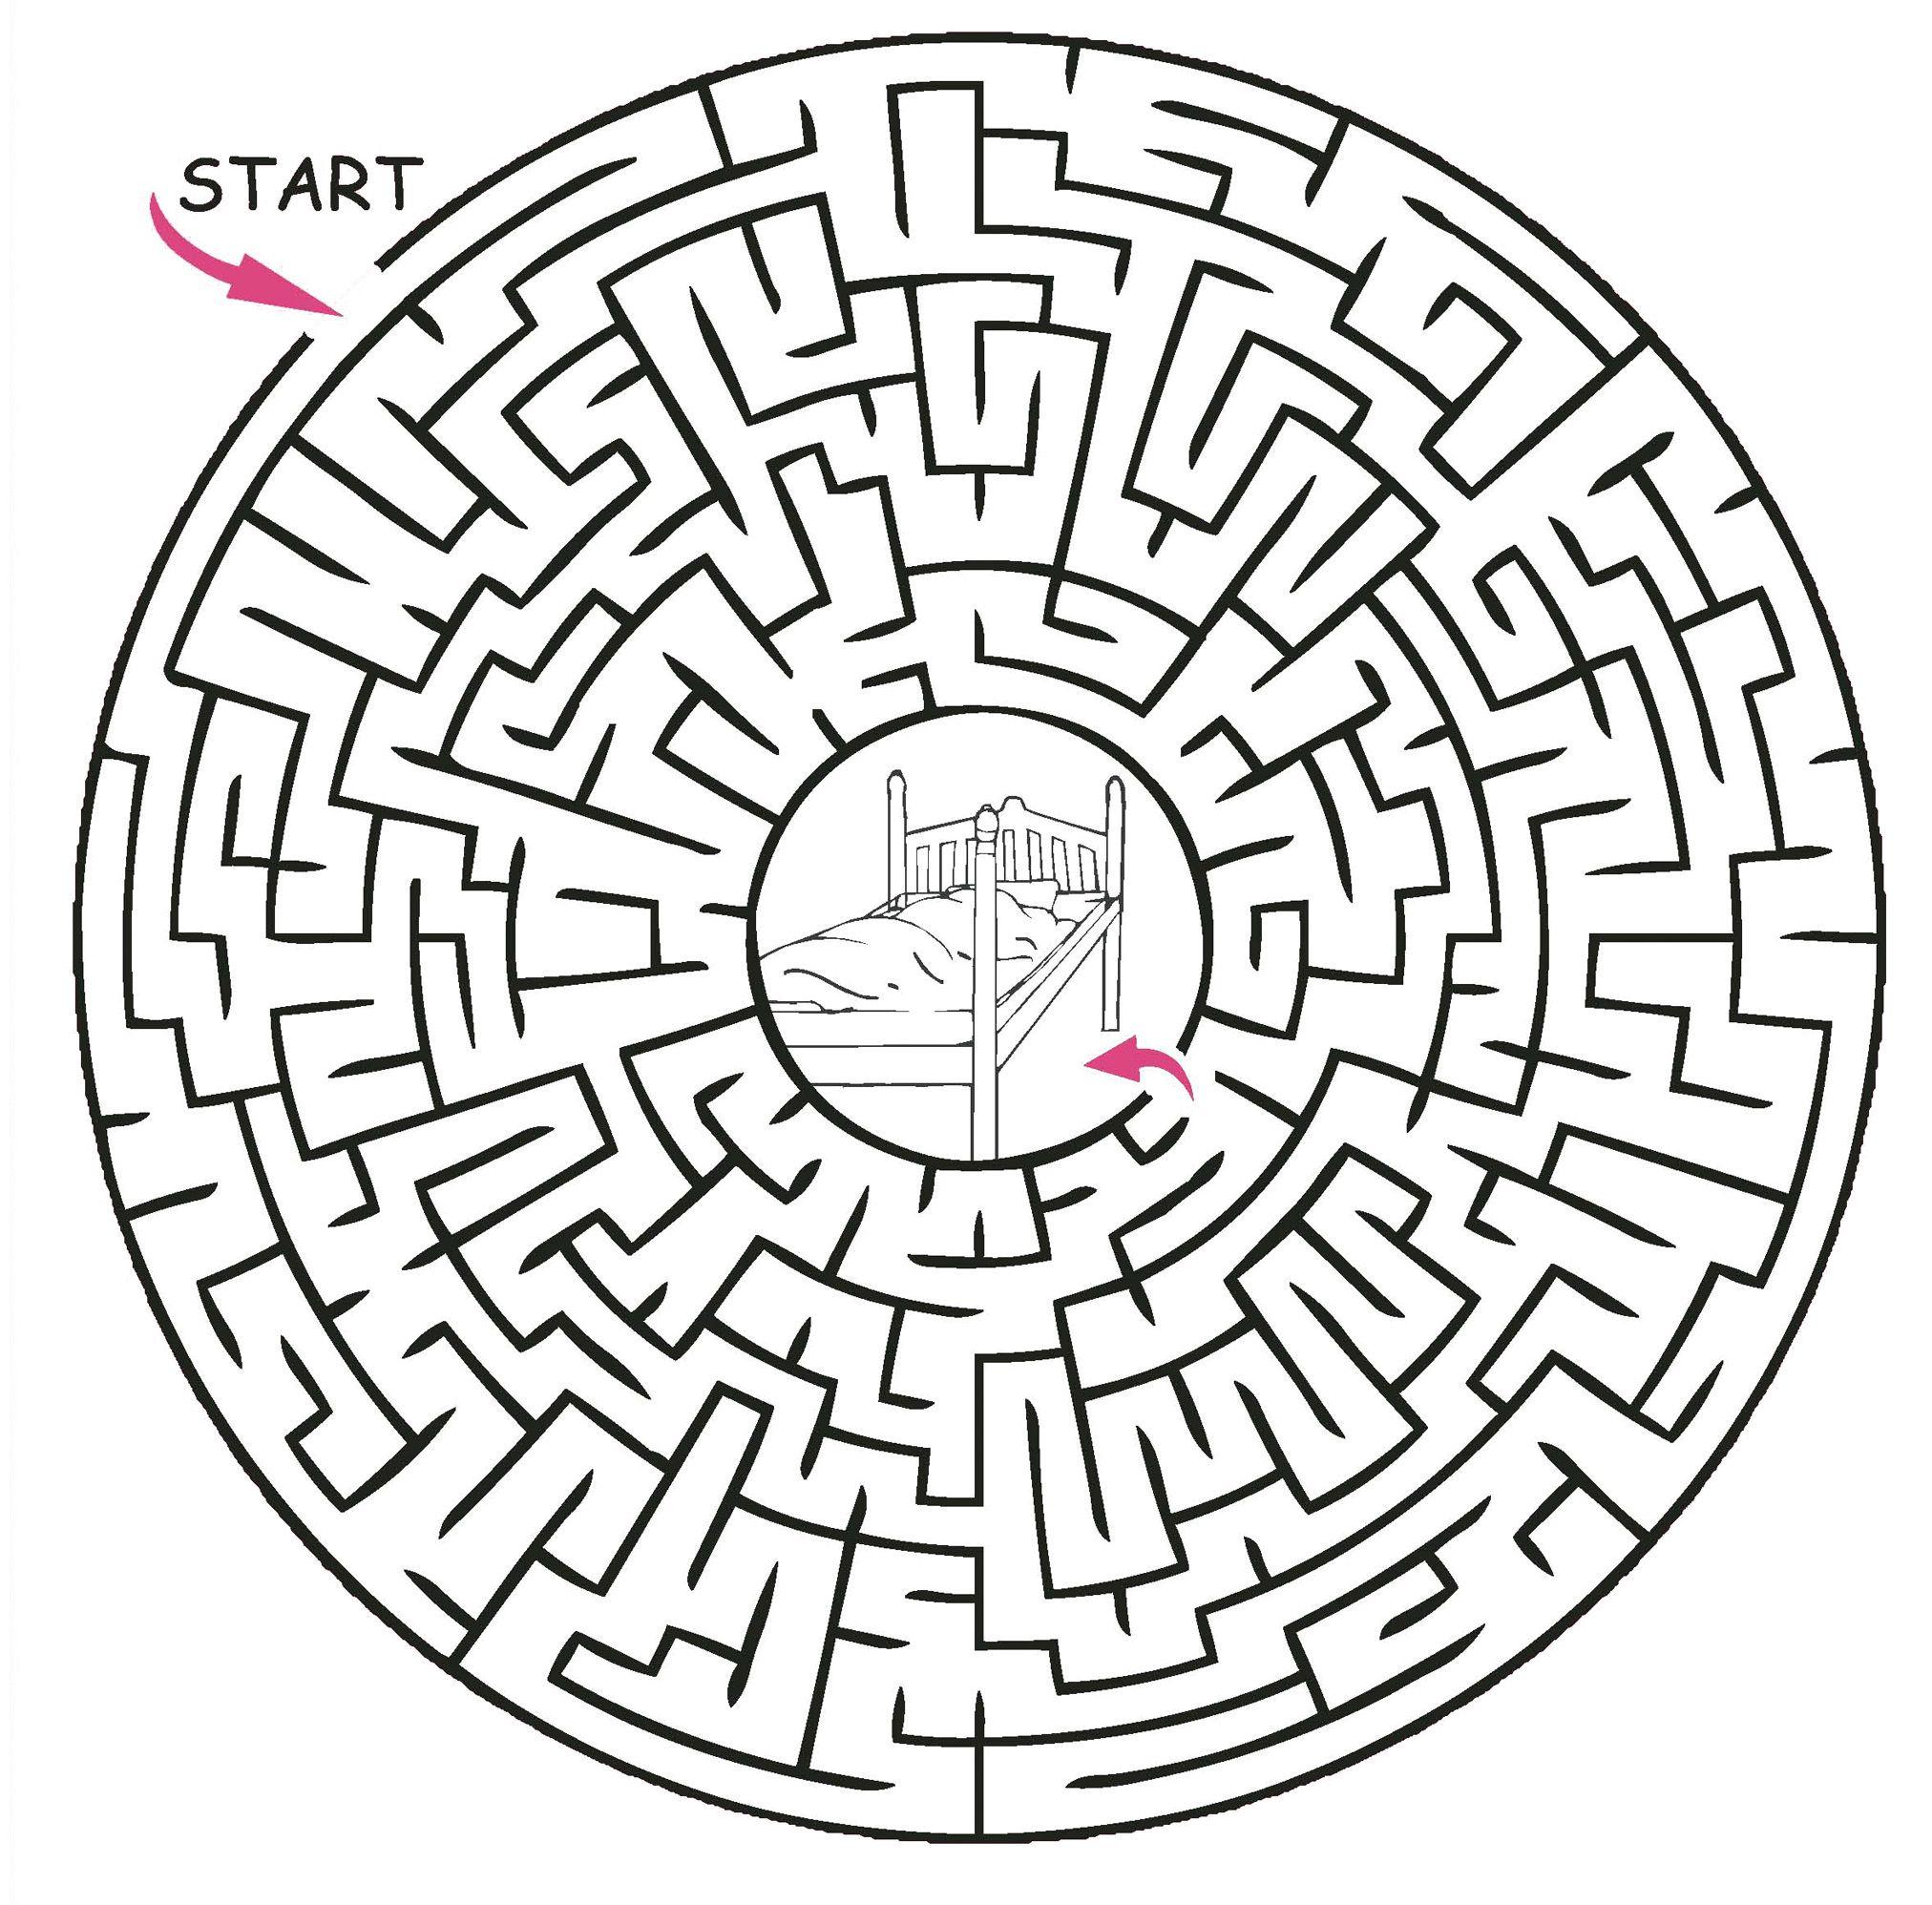 Printable Maze Puzzles